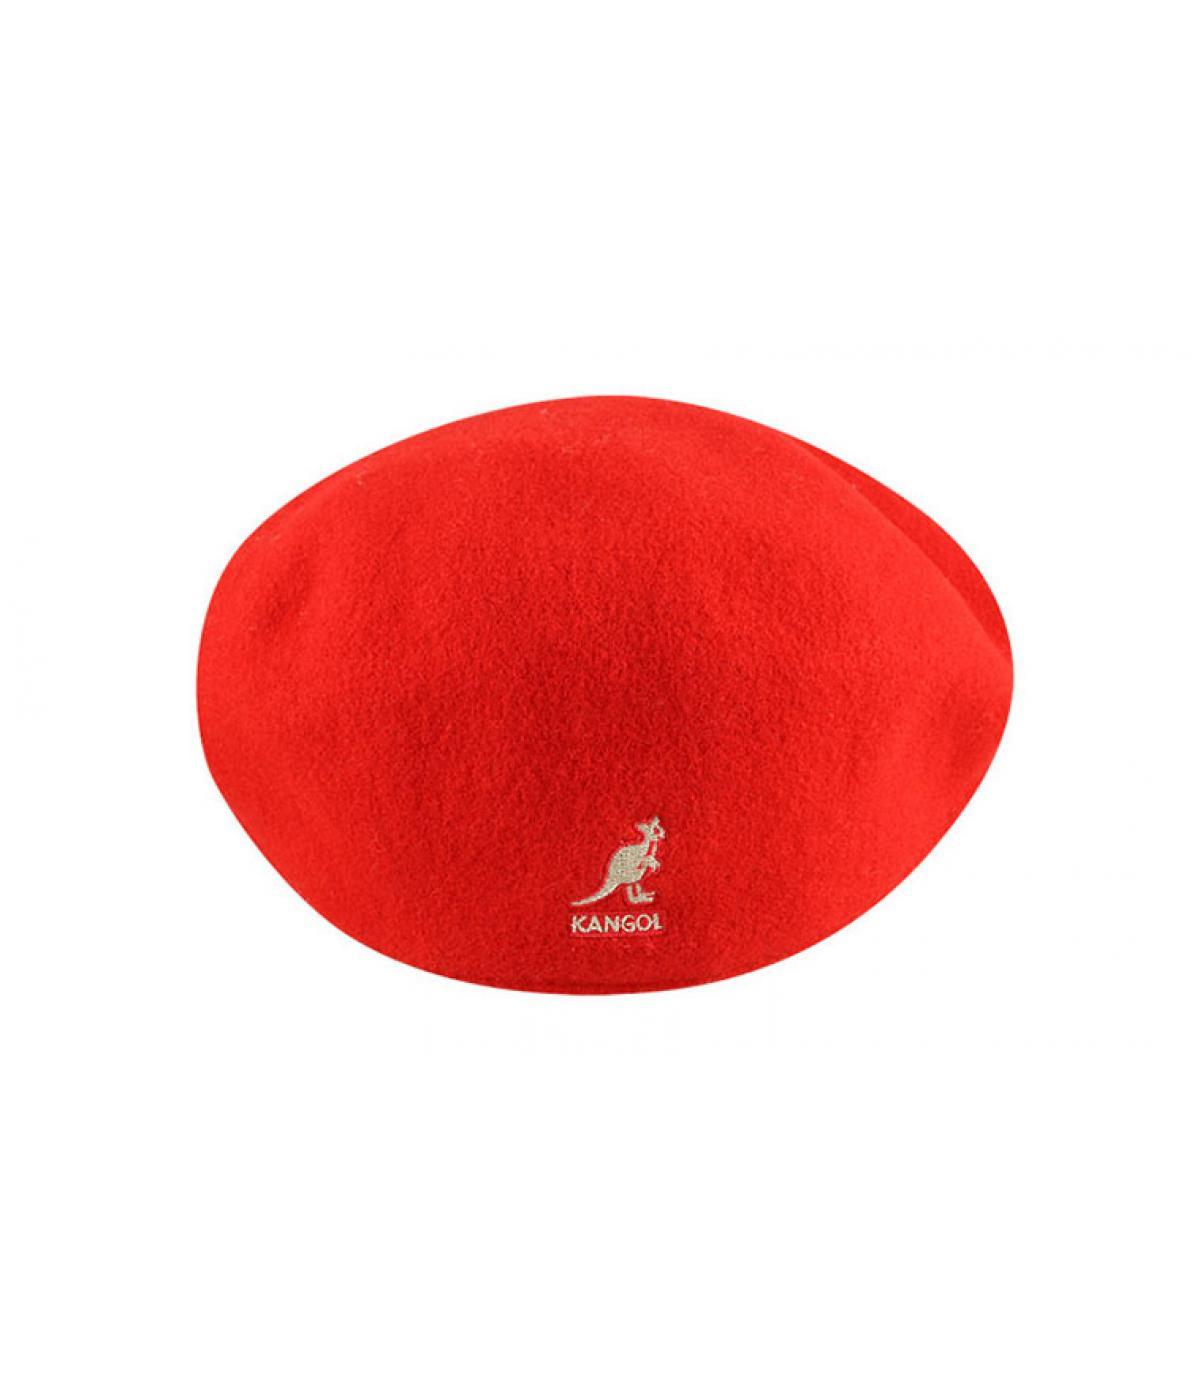 Detalles 504 wool rojo imagen 4